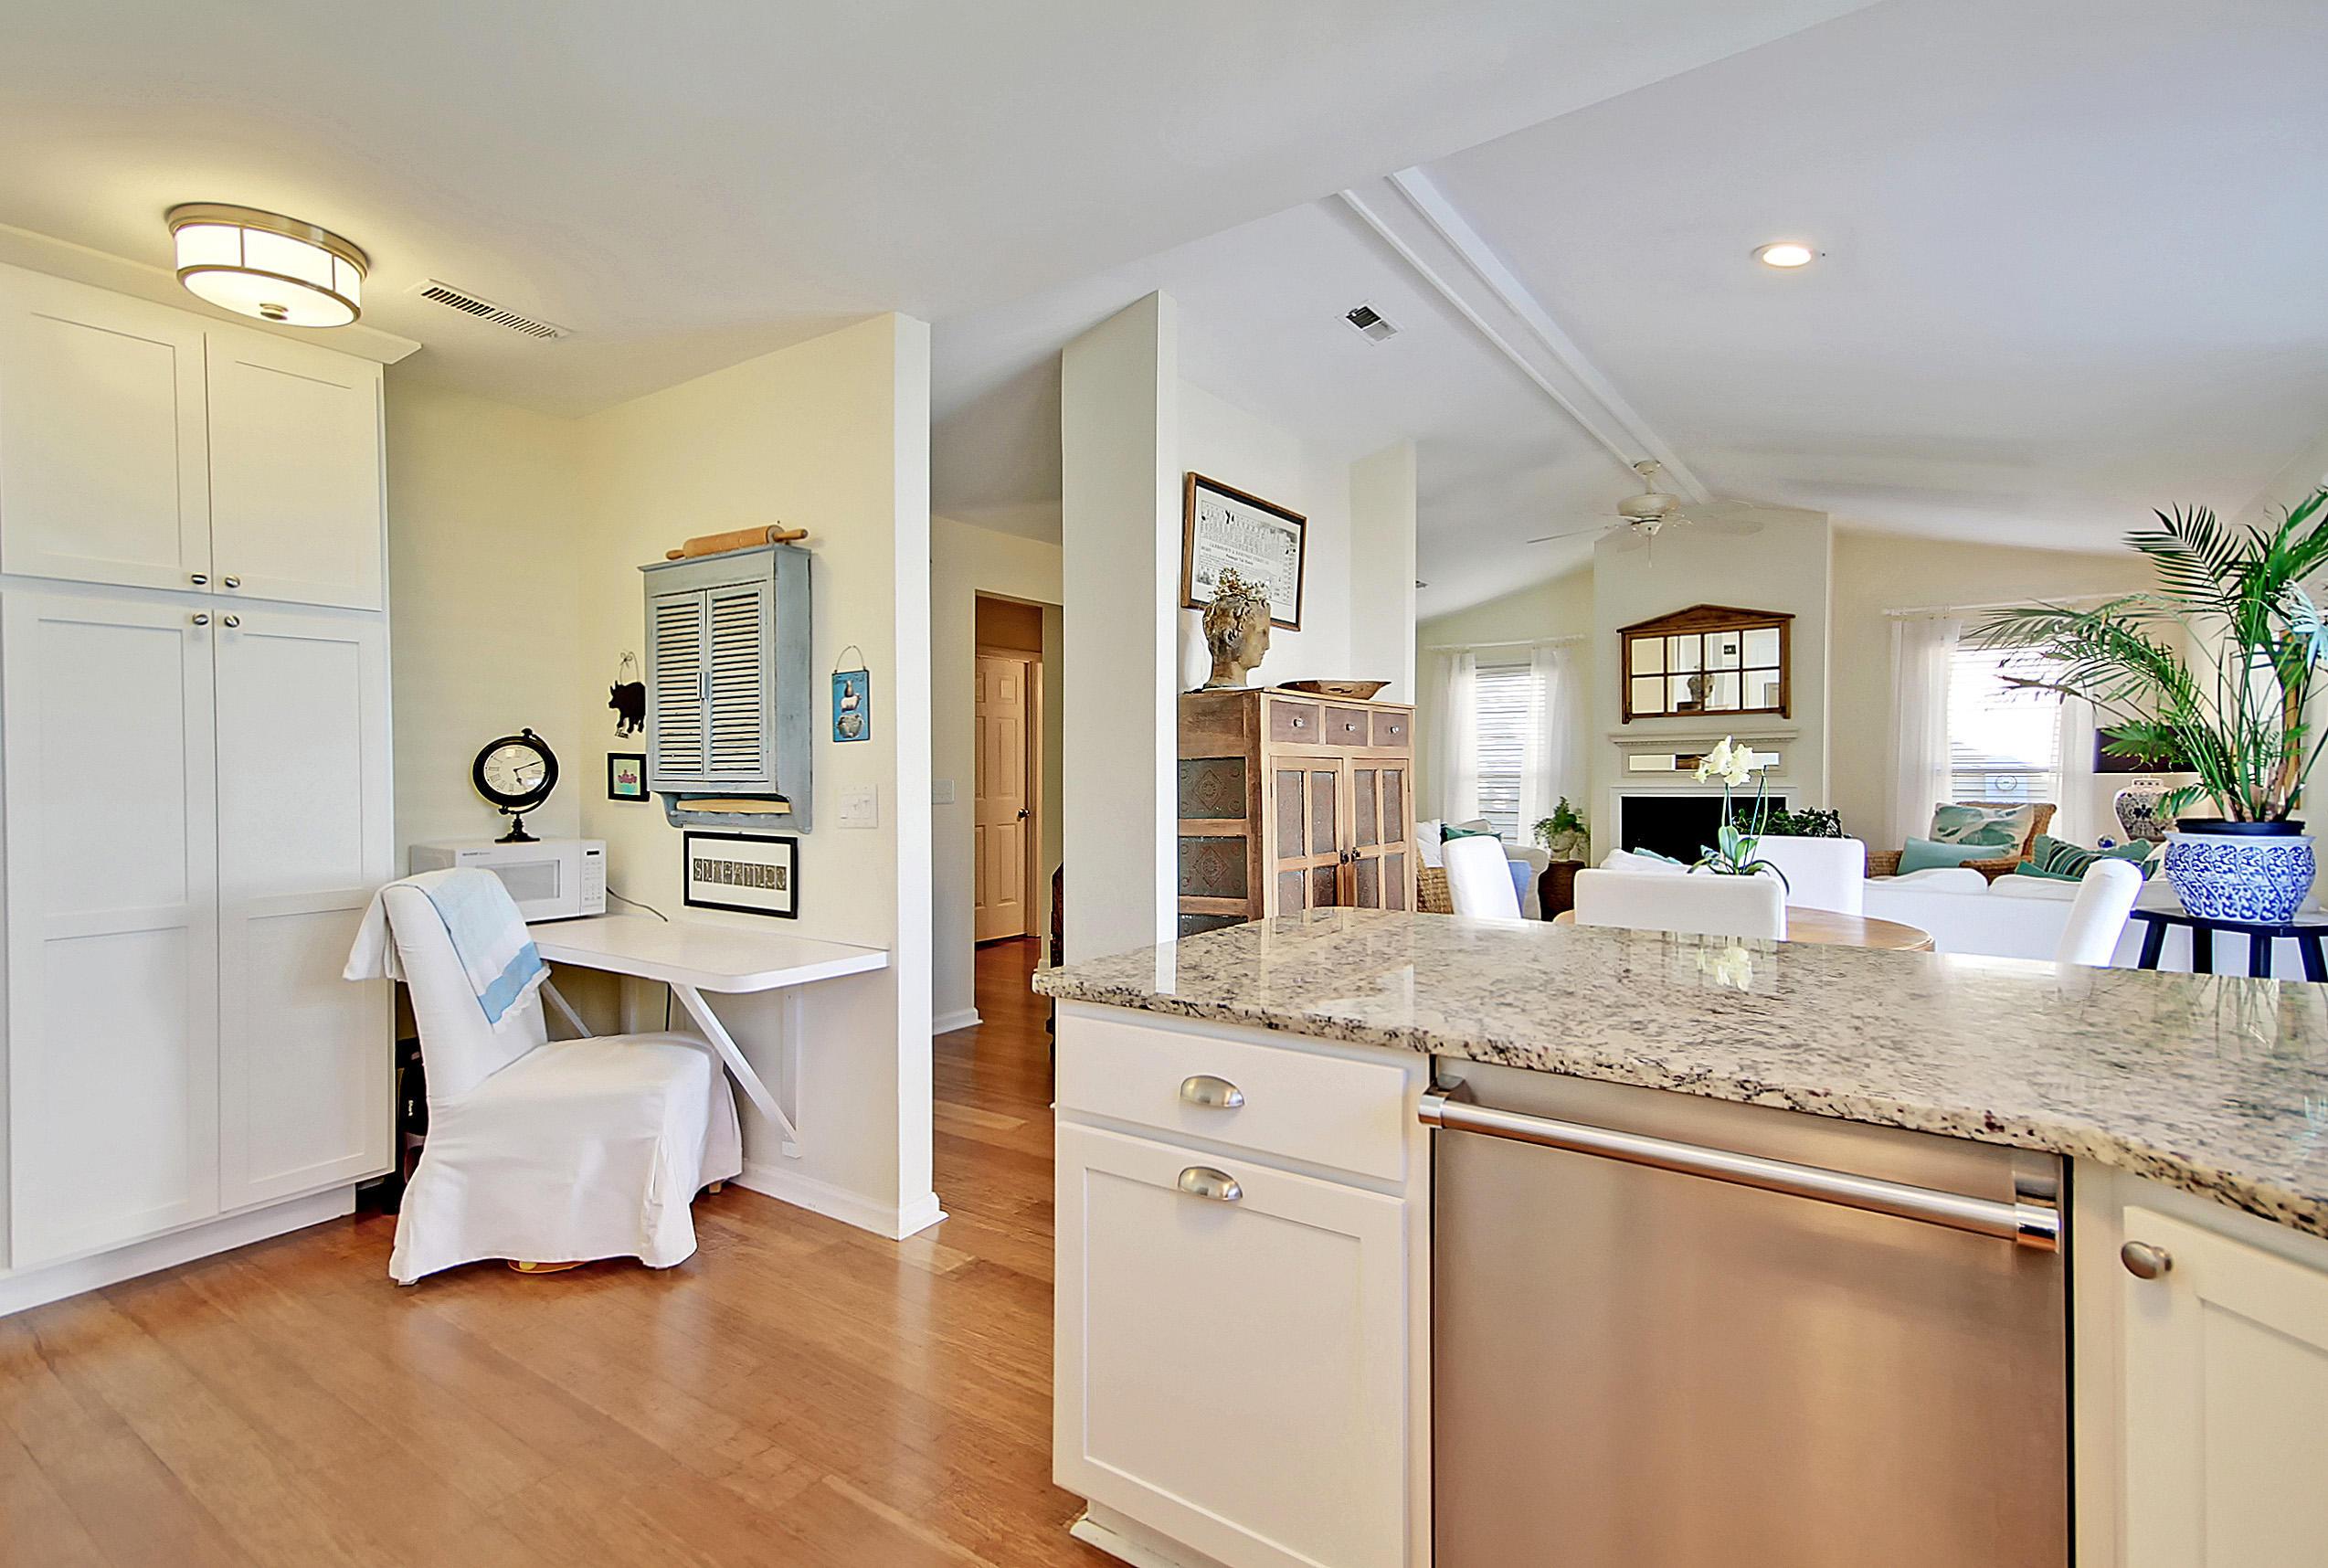 Pirates Cove Homes For Sale - 1492 Ketch, Mount Pleasant, SC - 30